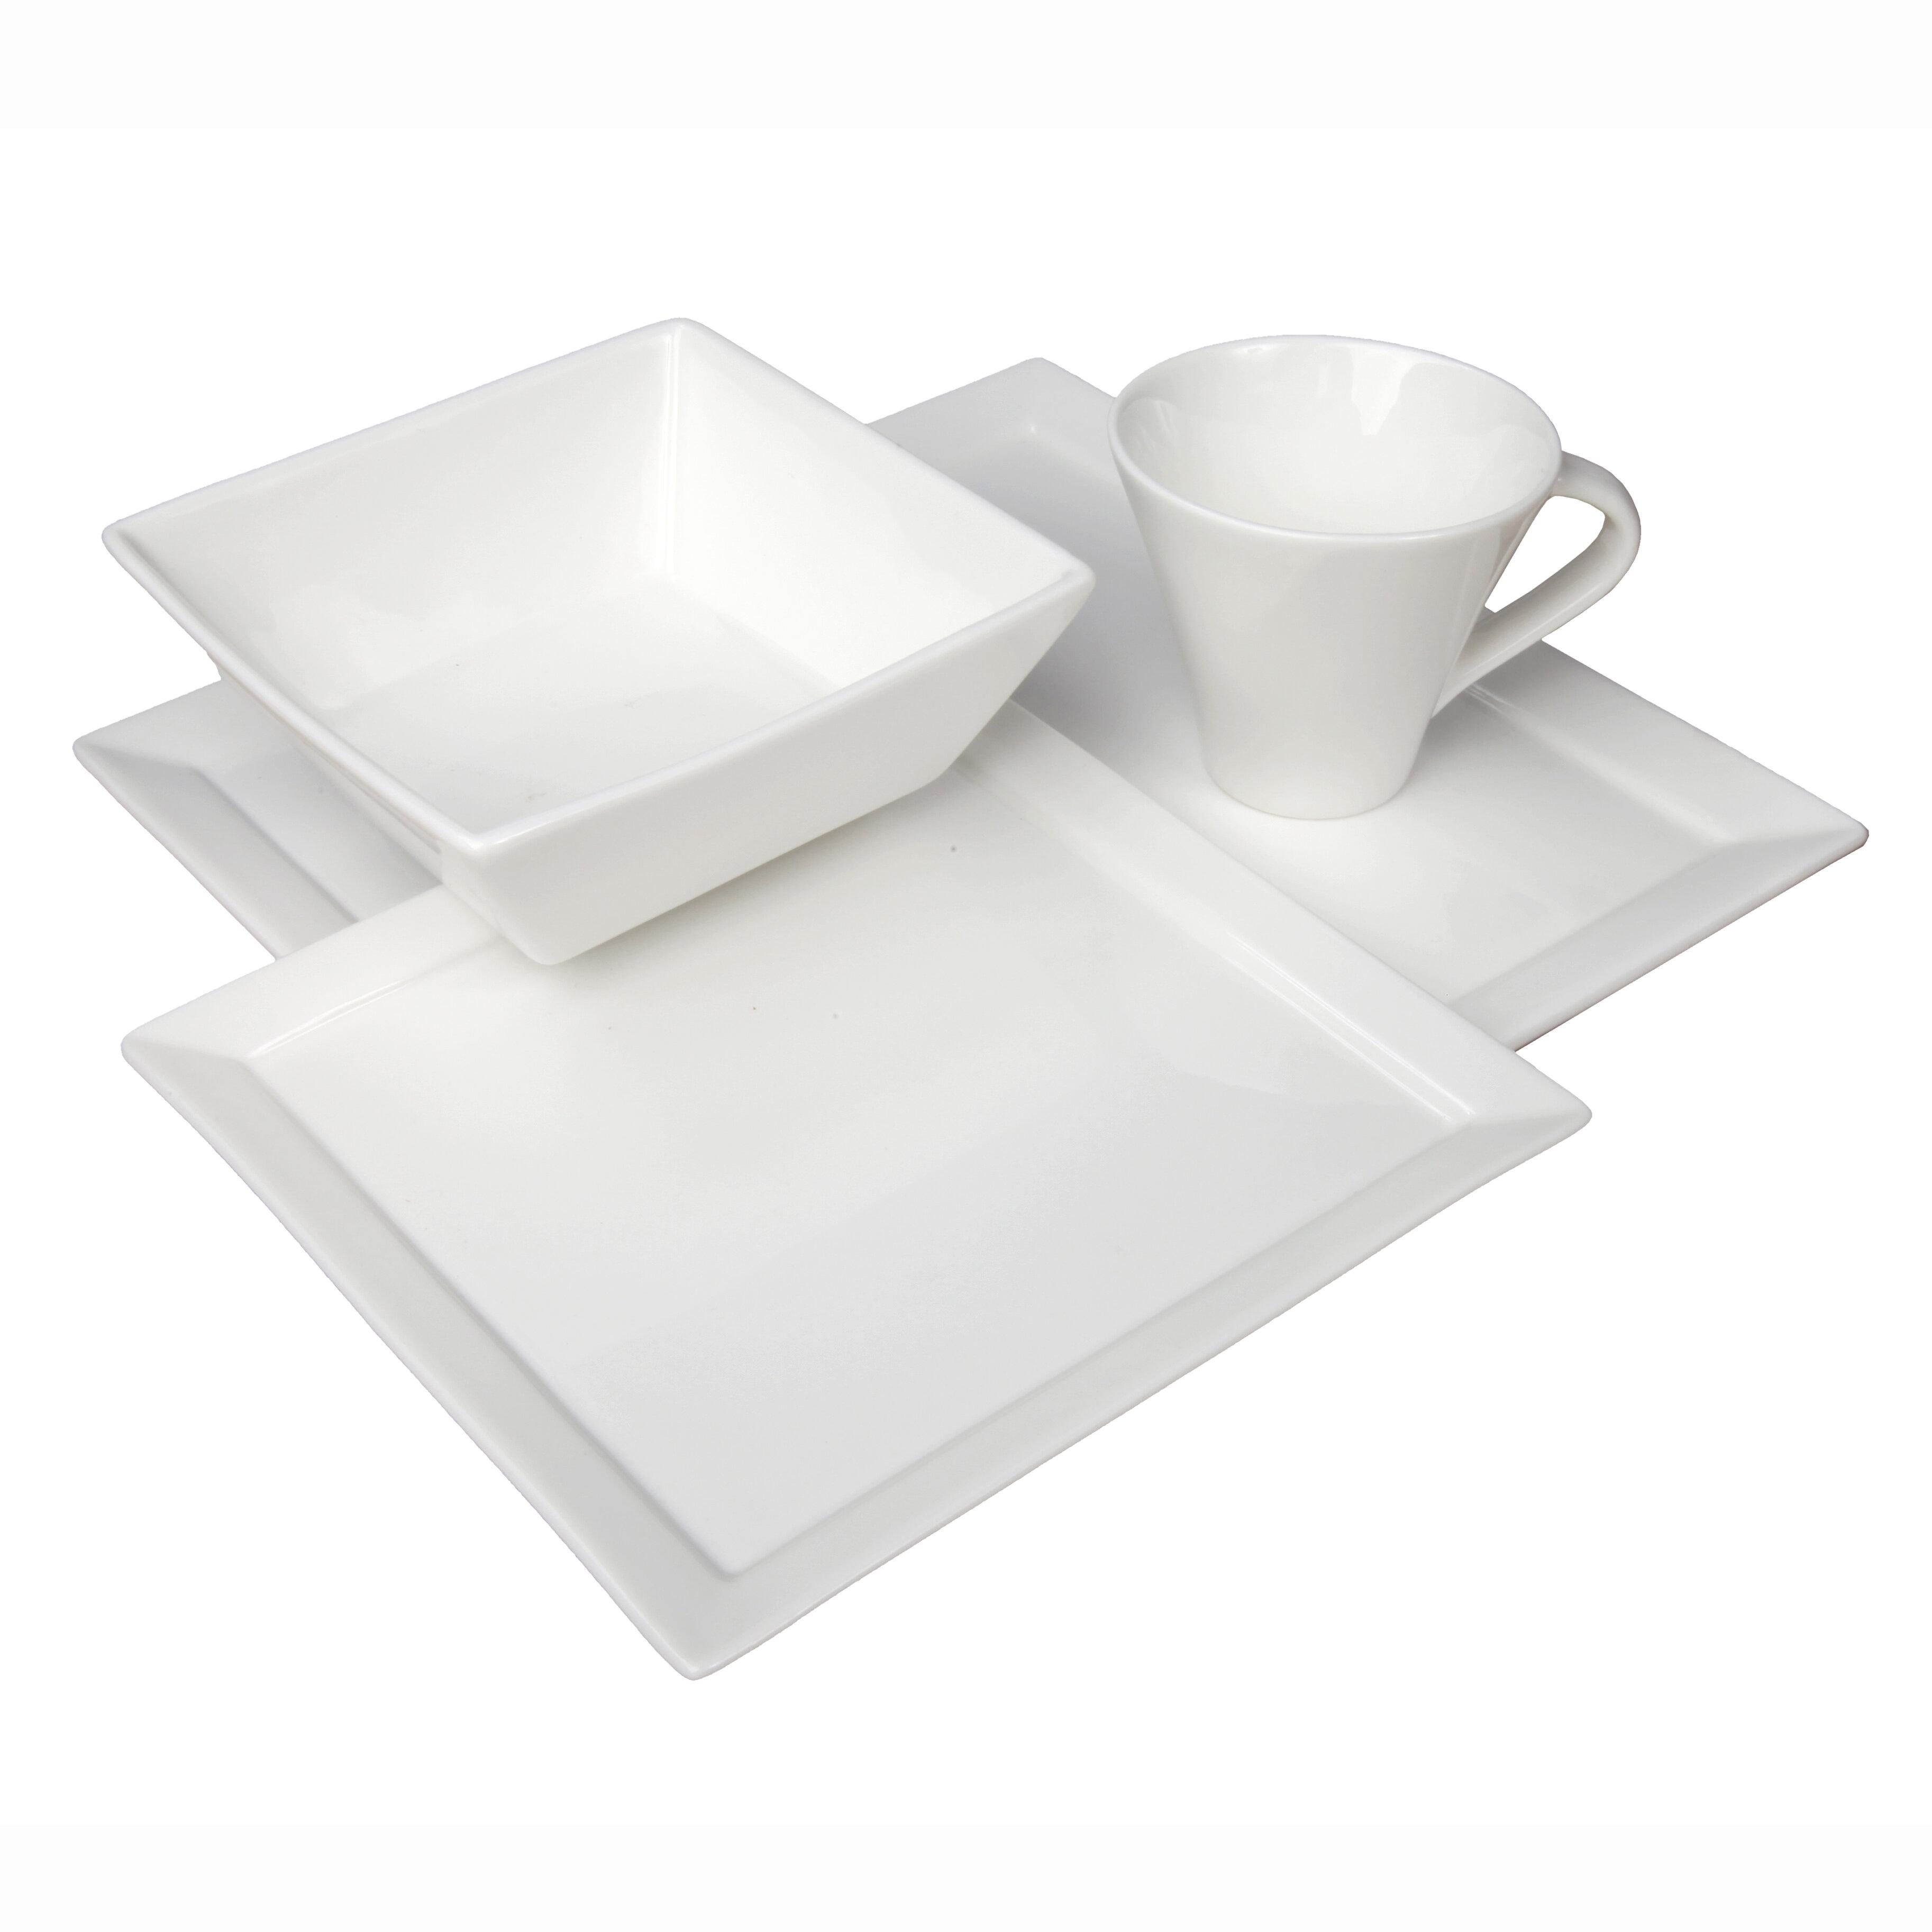 4-Piece Coffee Service Set Fortessa Fortaluxe Vitrified China Dinnerware